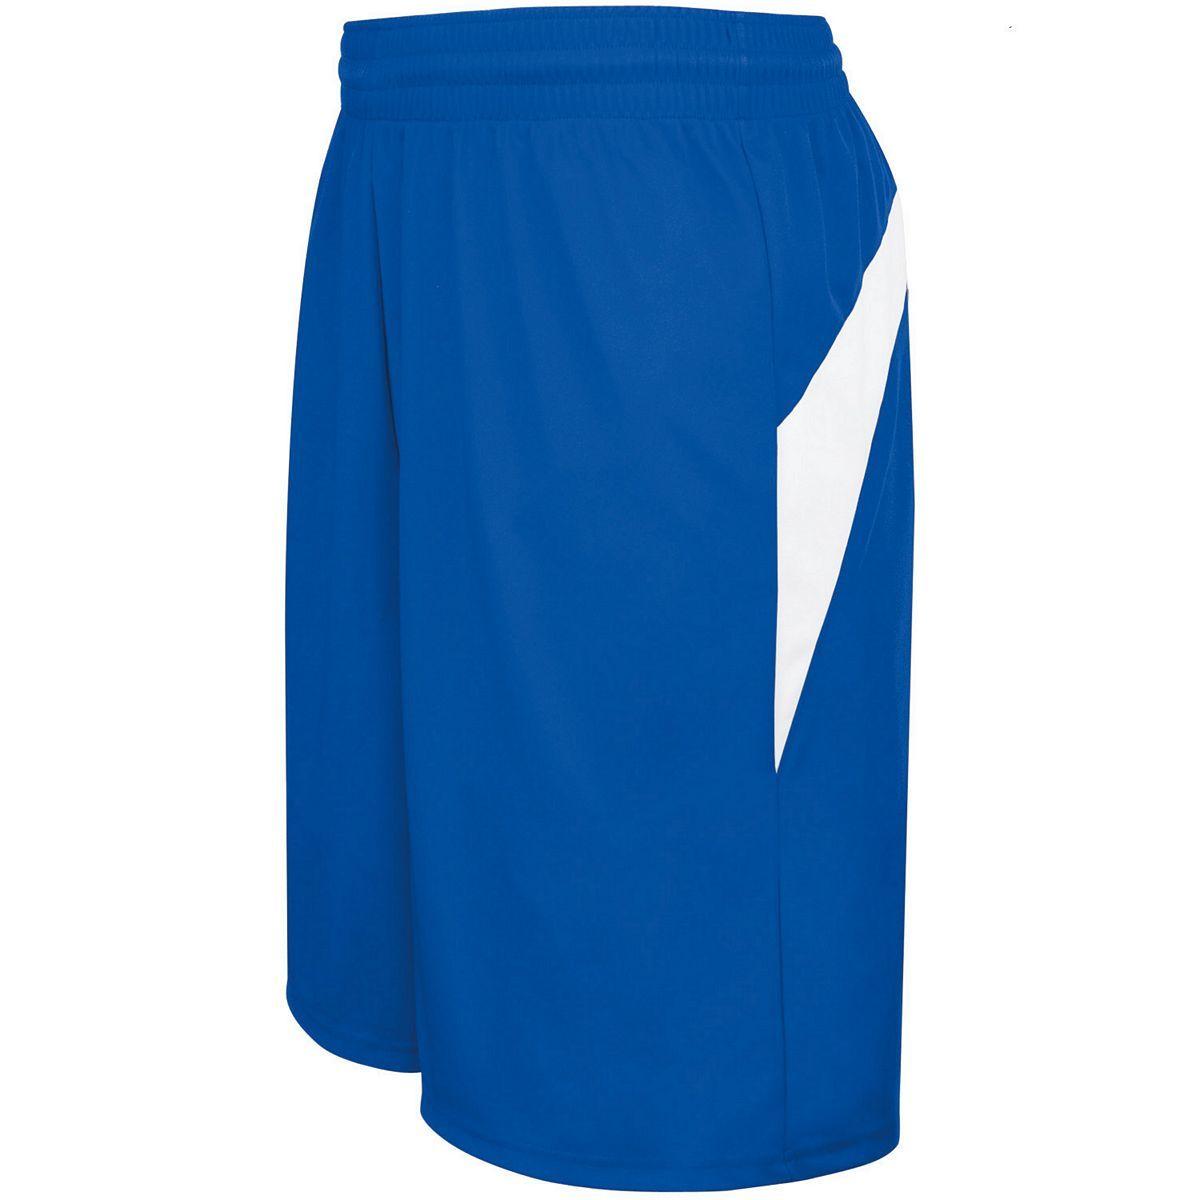 Adult Transition Game Shorts - ROYAL/WHITE